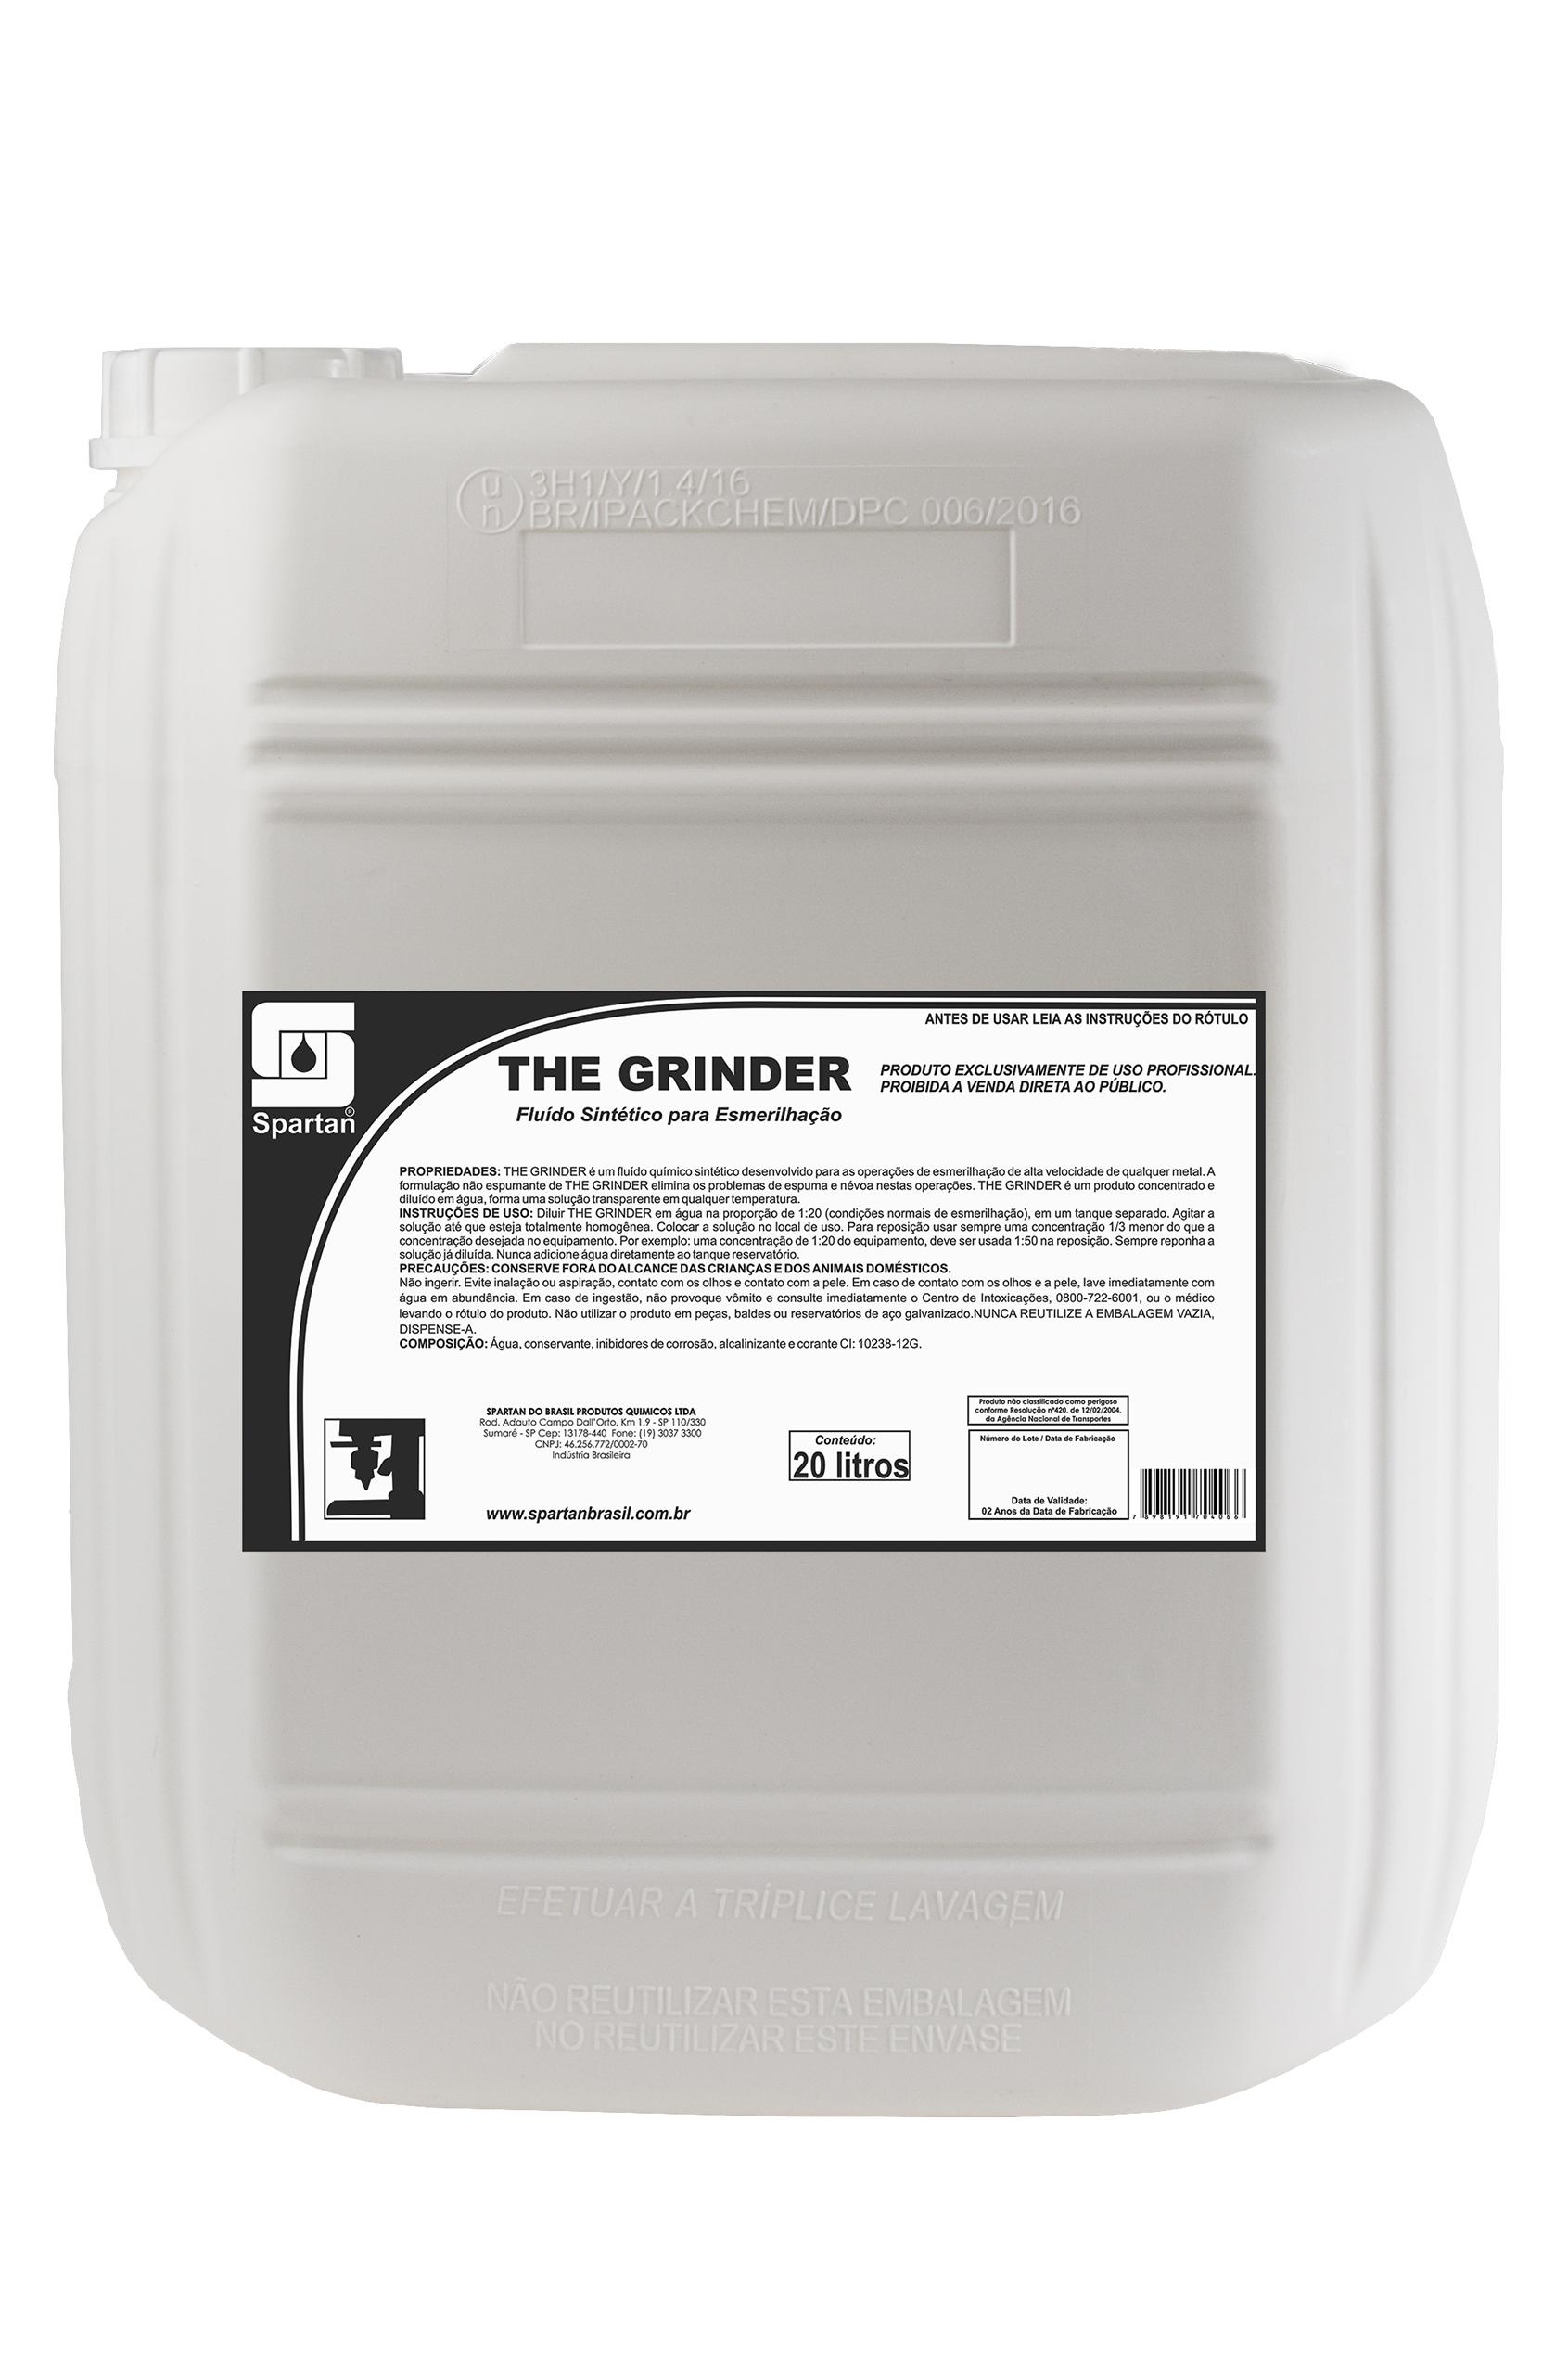 Imagem ilustrativa do produto: The Grinder